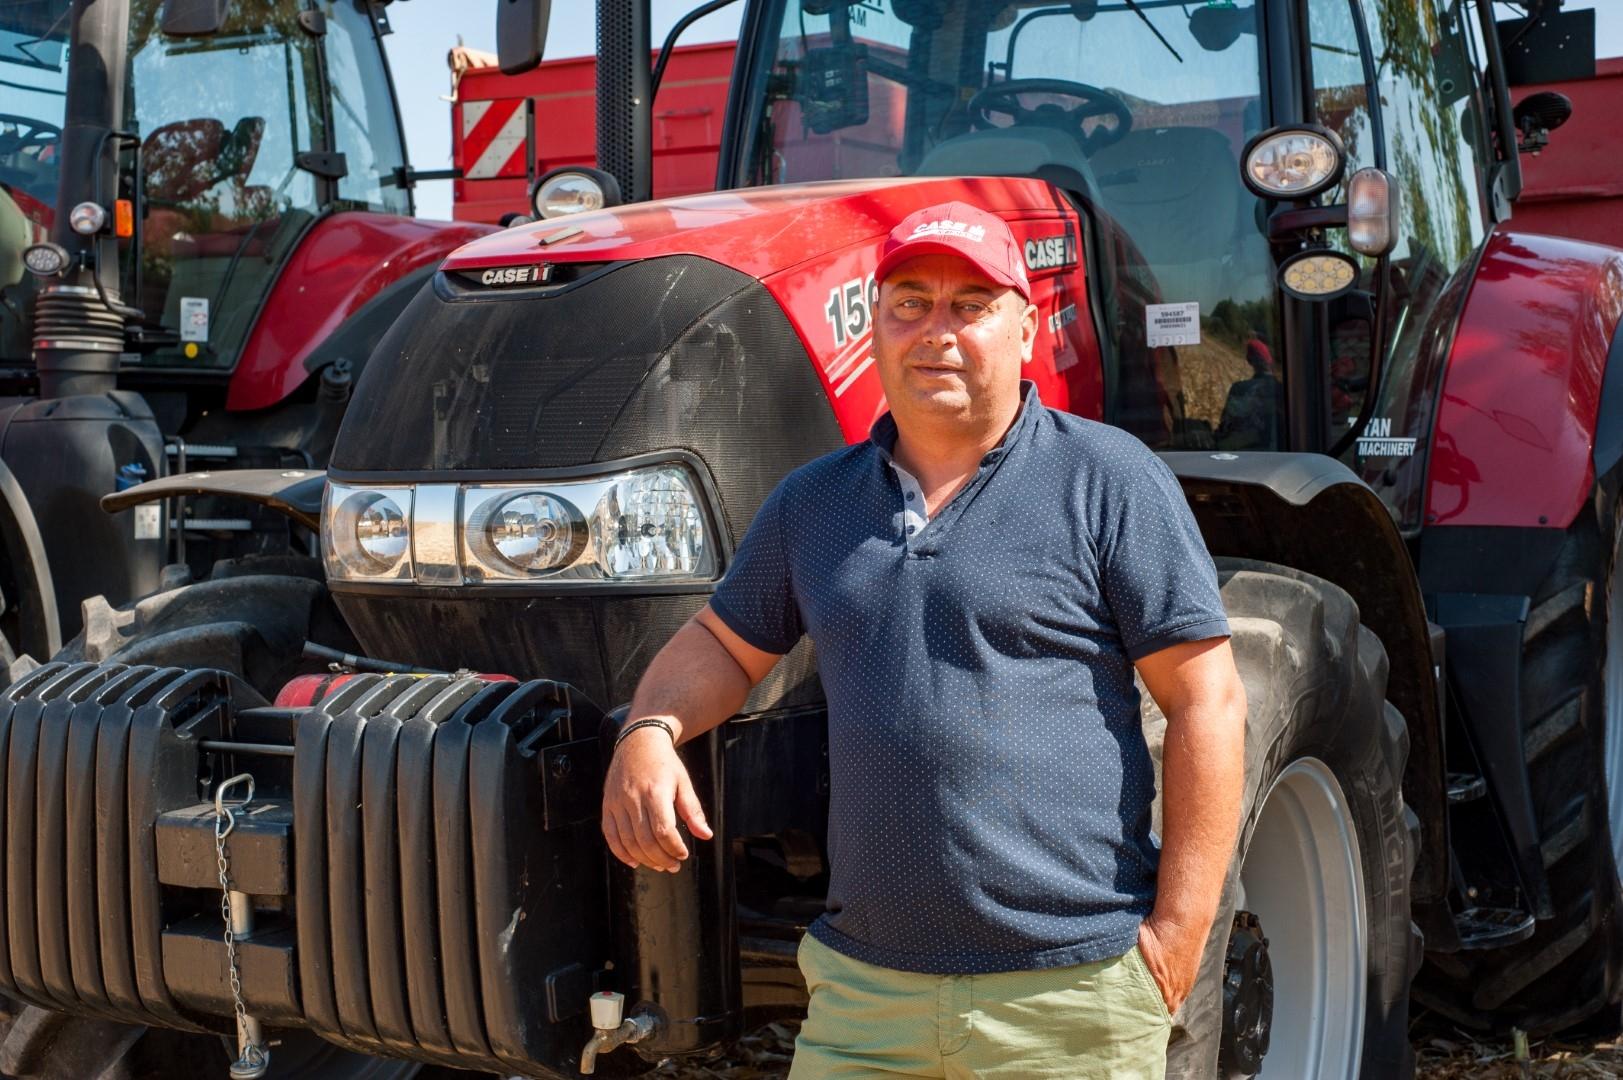 case-ih-tractor-magnum-rowtrac-farmlift-maxxum